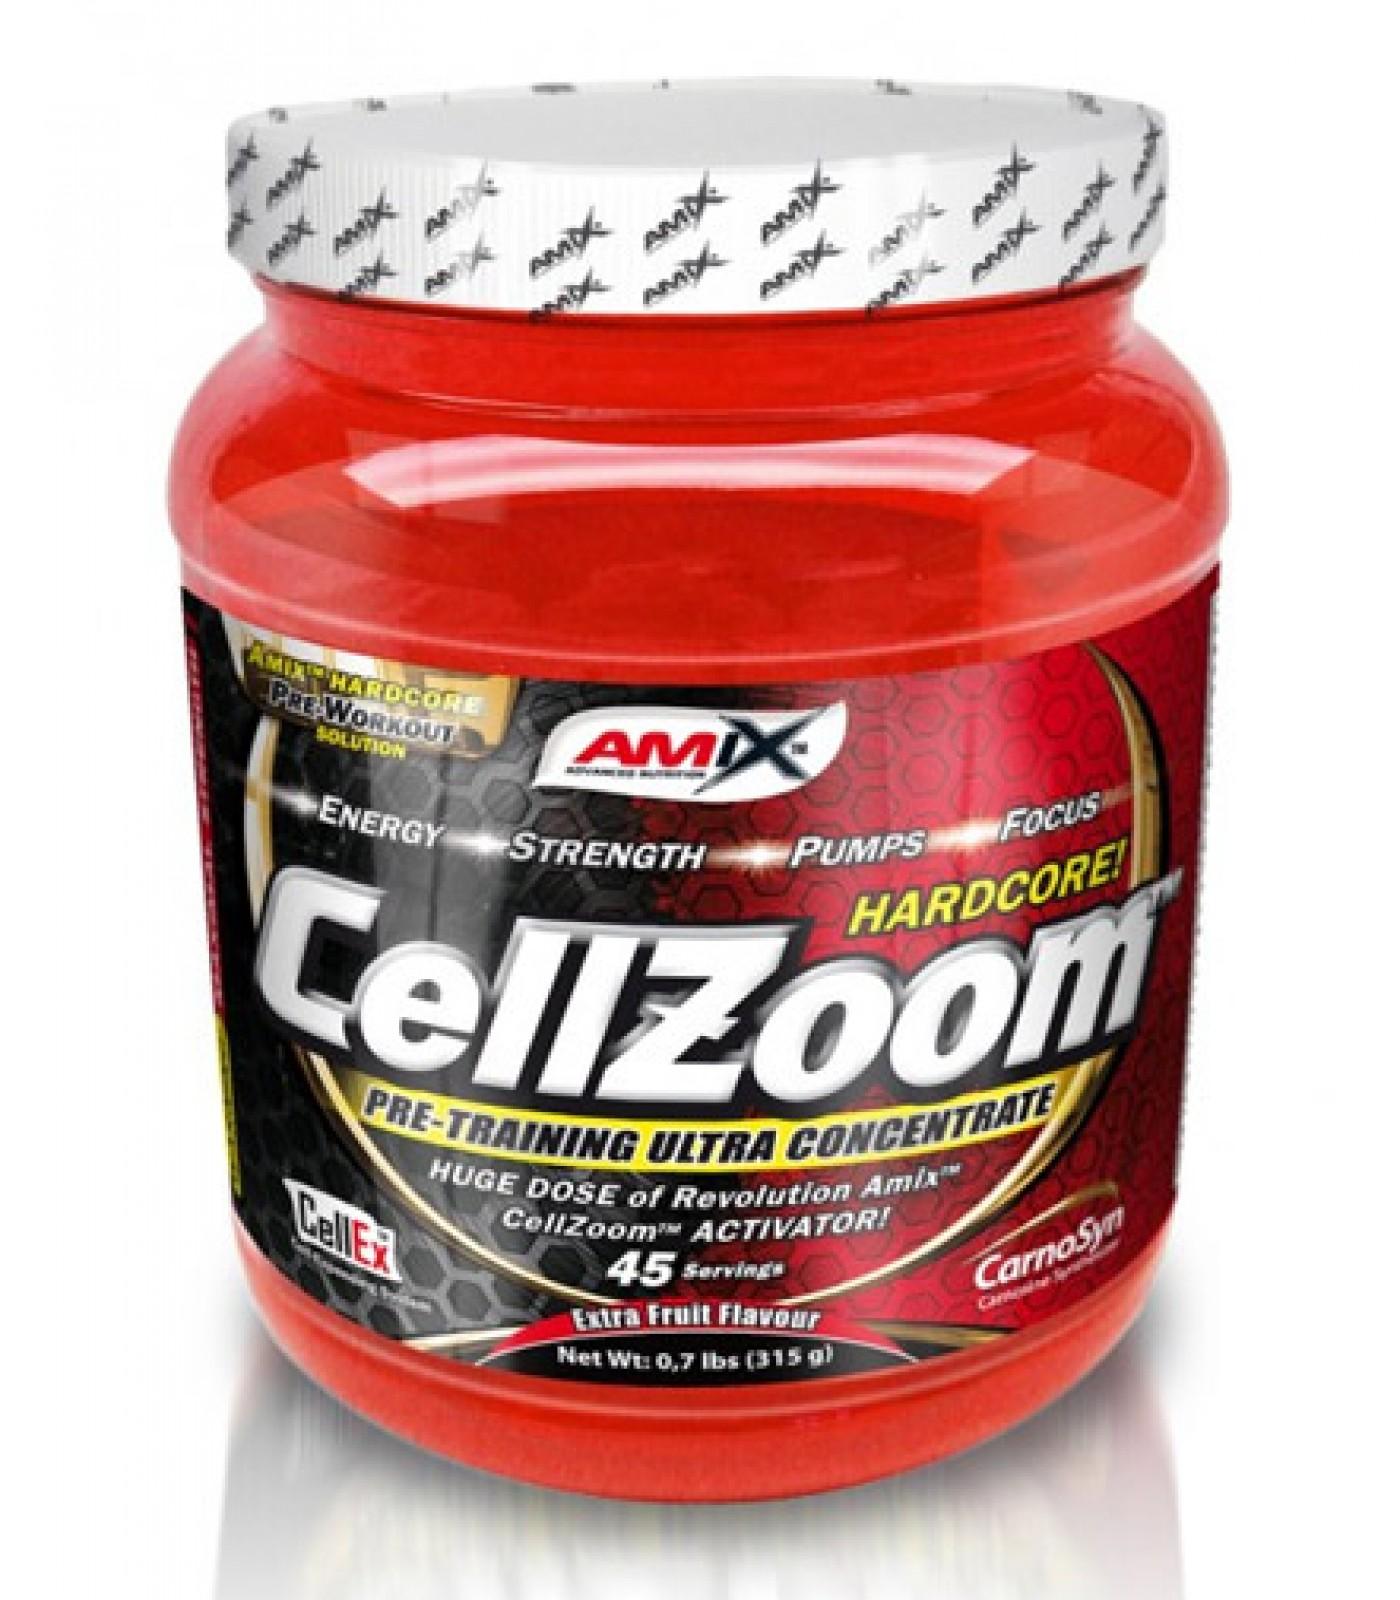 Amix - CellZoom ® Hardcore Activator / 315gr.